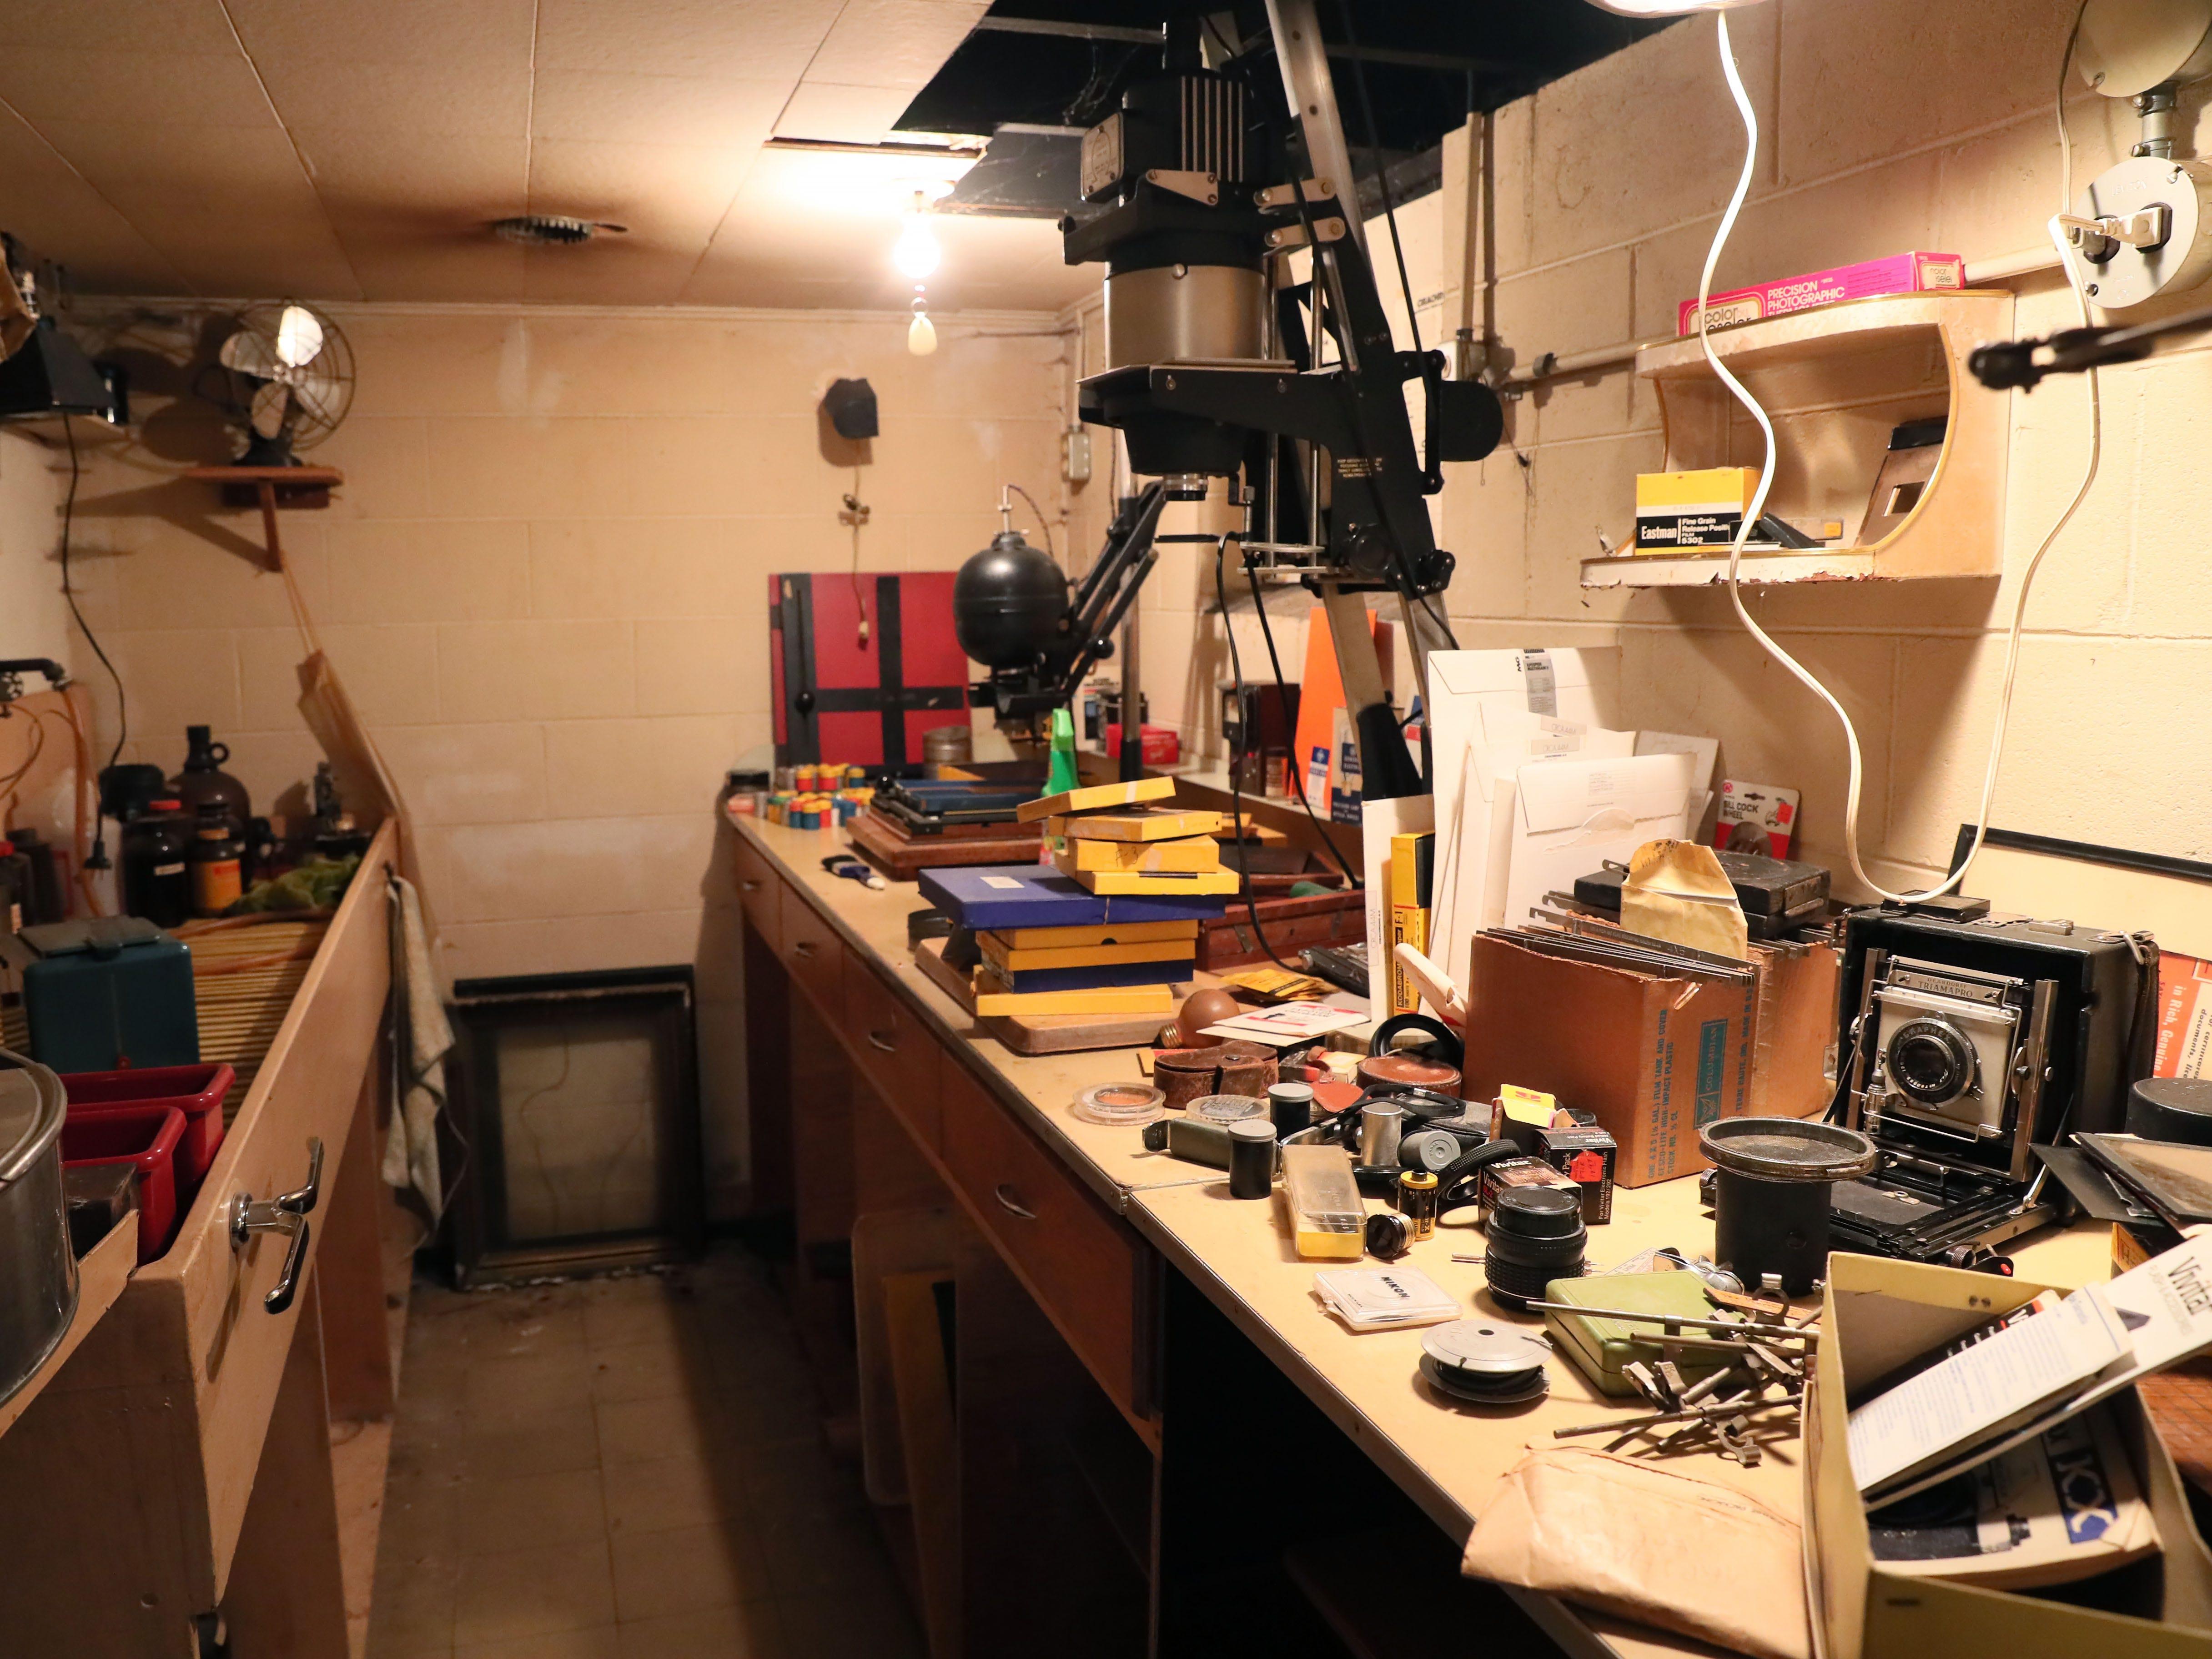 This is Jake Skocir's basement darkroom.